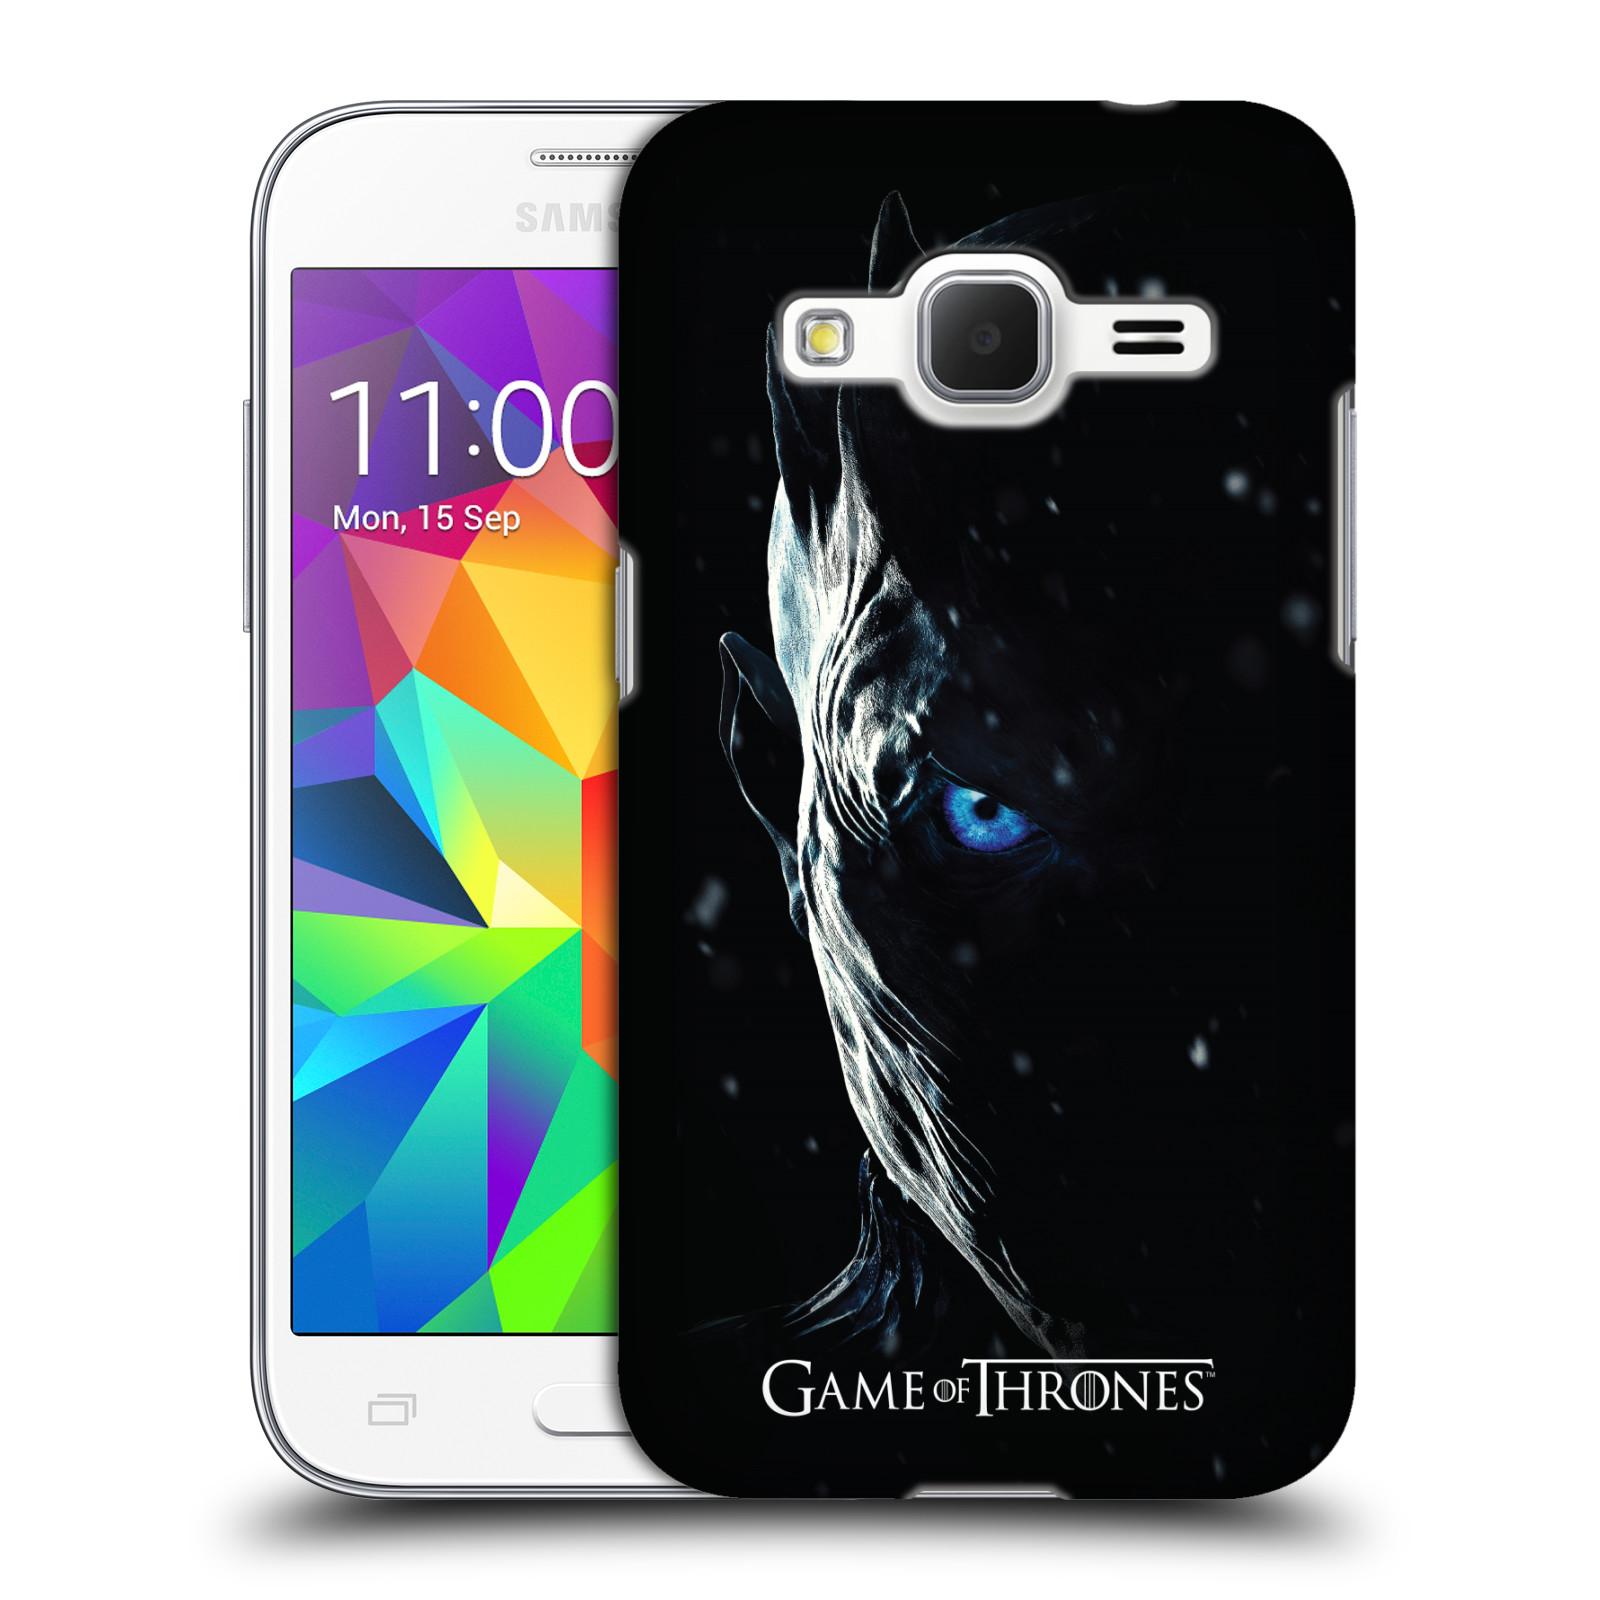 Plastové pouzdro na mobil Samsung Galaxy Core Prime LTE - Head Case - Hra o trůny - Night King (Plastový kryt či obal na mobilní telefon s motivem Game of Thrones - Night King - Season 7 pro Samsung Galaxy Core Prime LTE SM-G360)